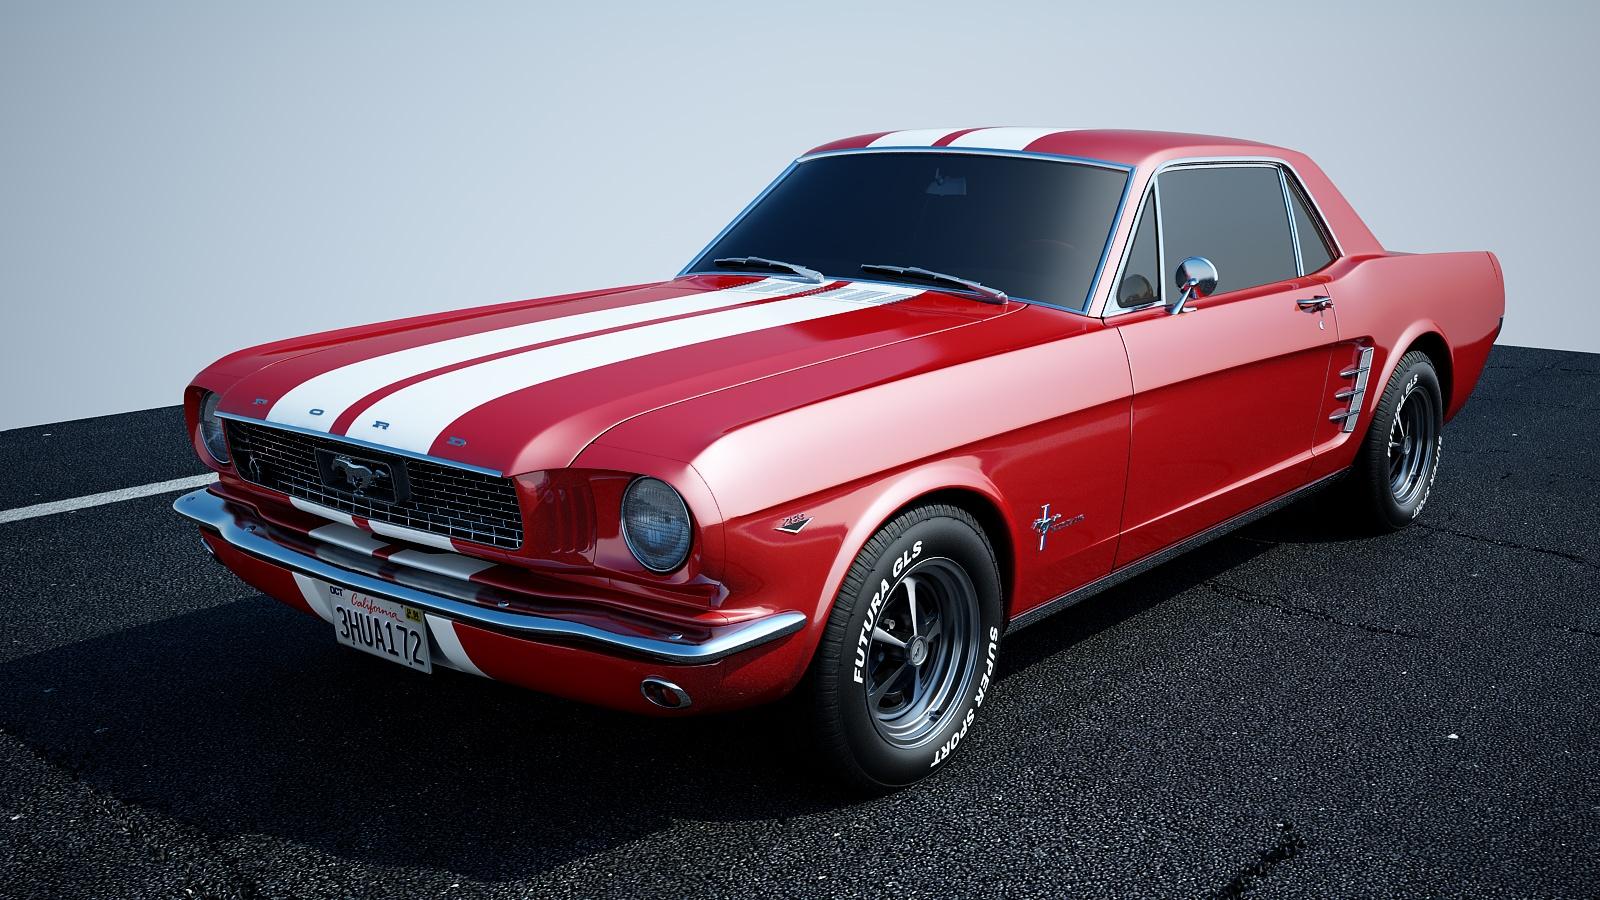 andrej stefancik automotive cg ford mustang 1966 coupe. Black Bedroom Furniture Sets. Home Design Ideas